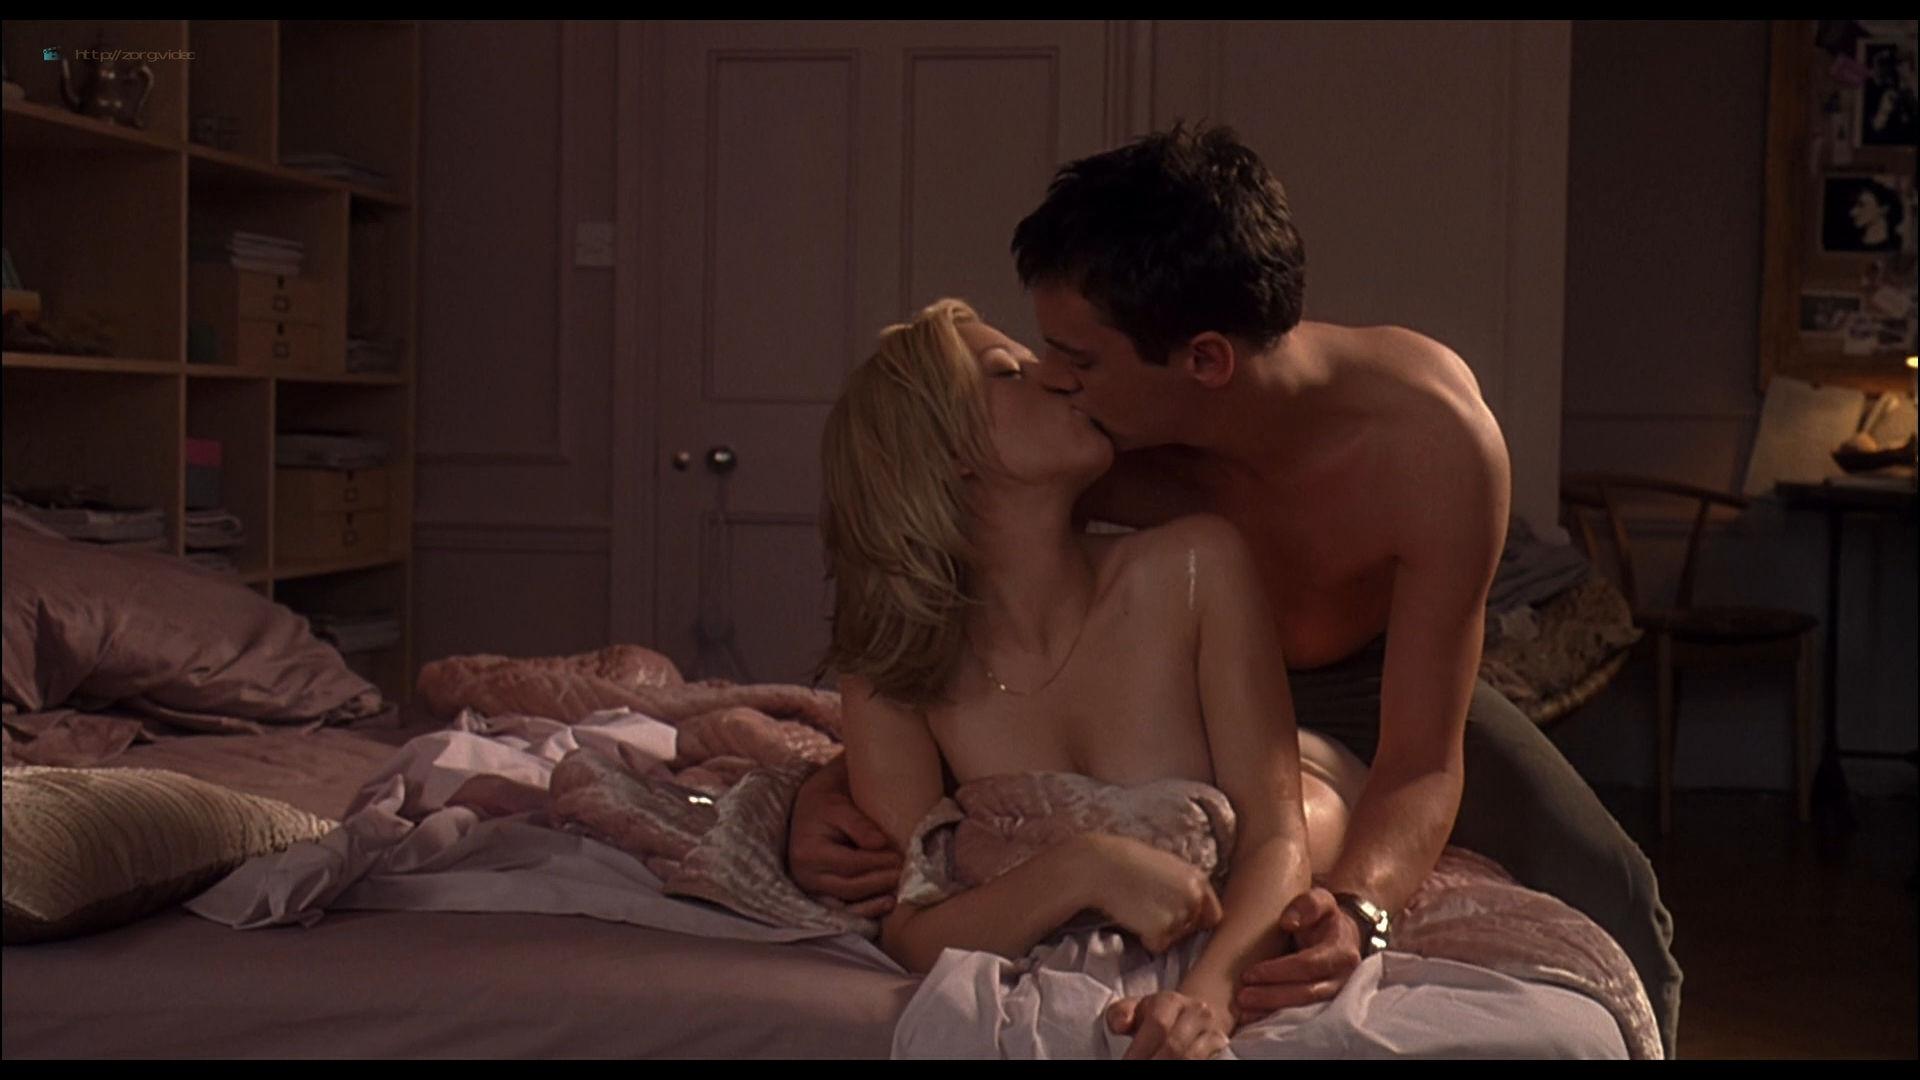 Scarlett Johansson see through and sex - Match Point (2005) HD 1080p BluRay (2)